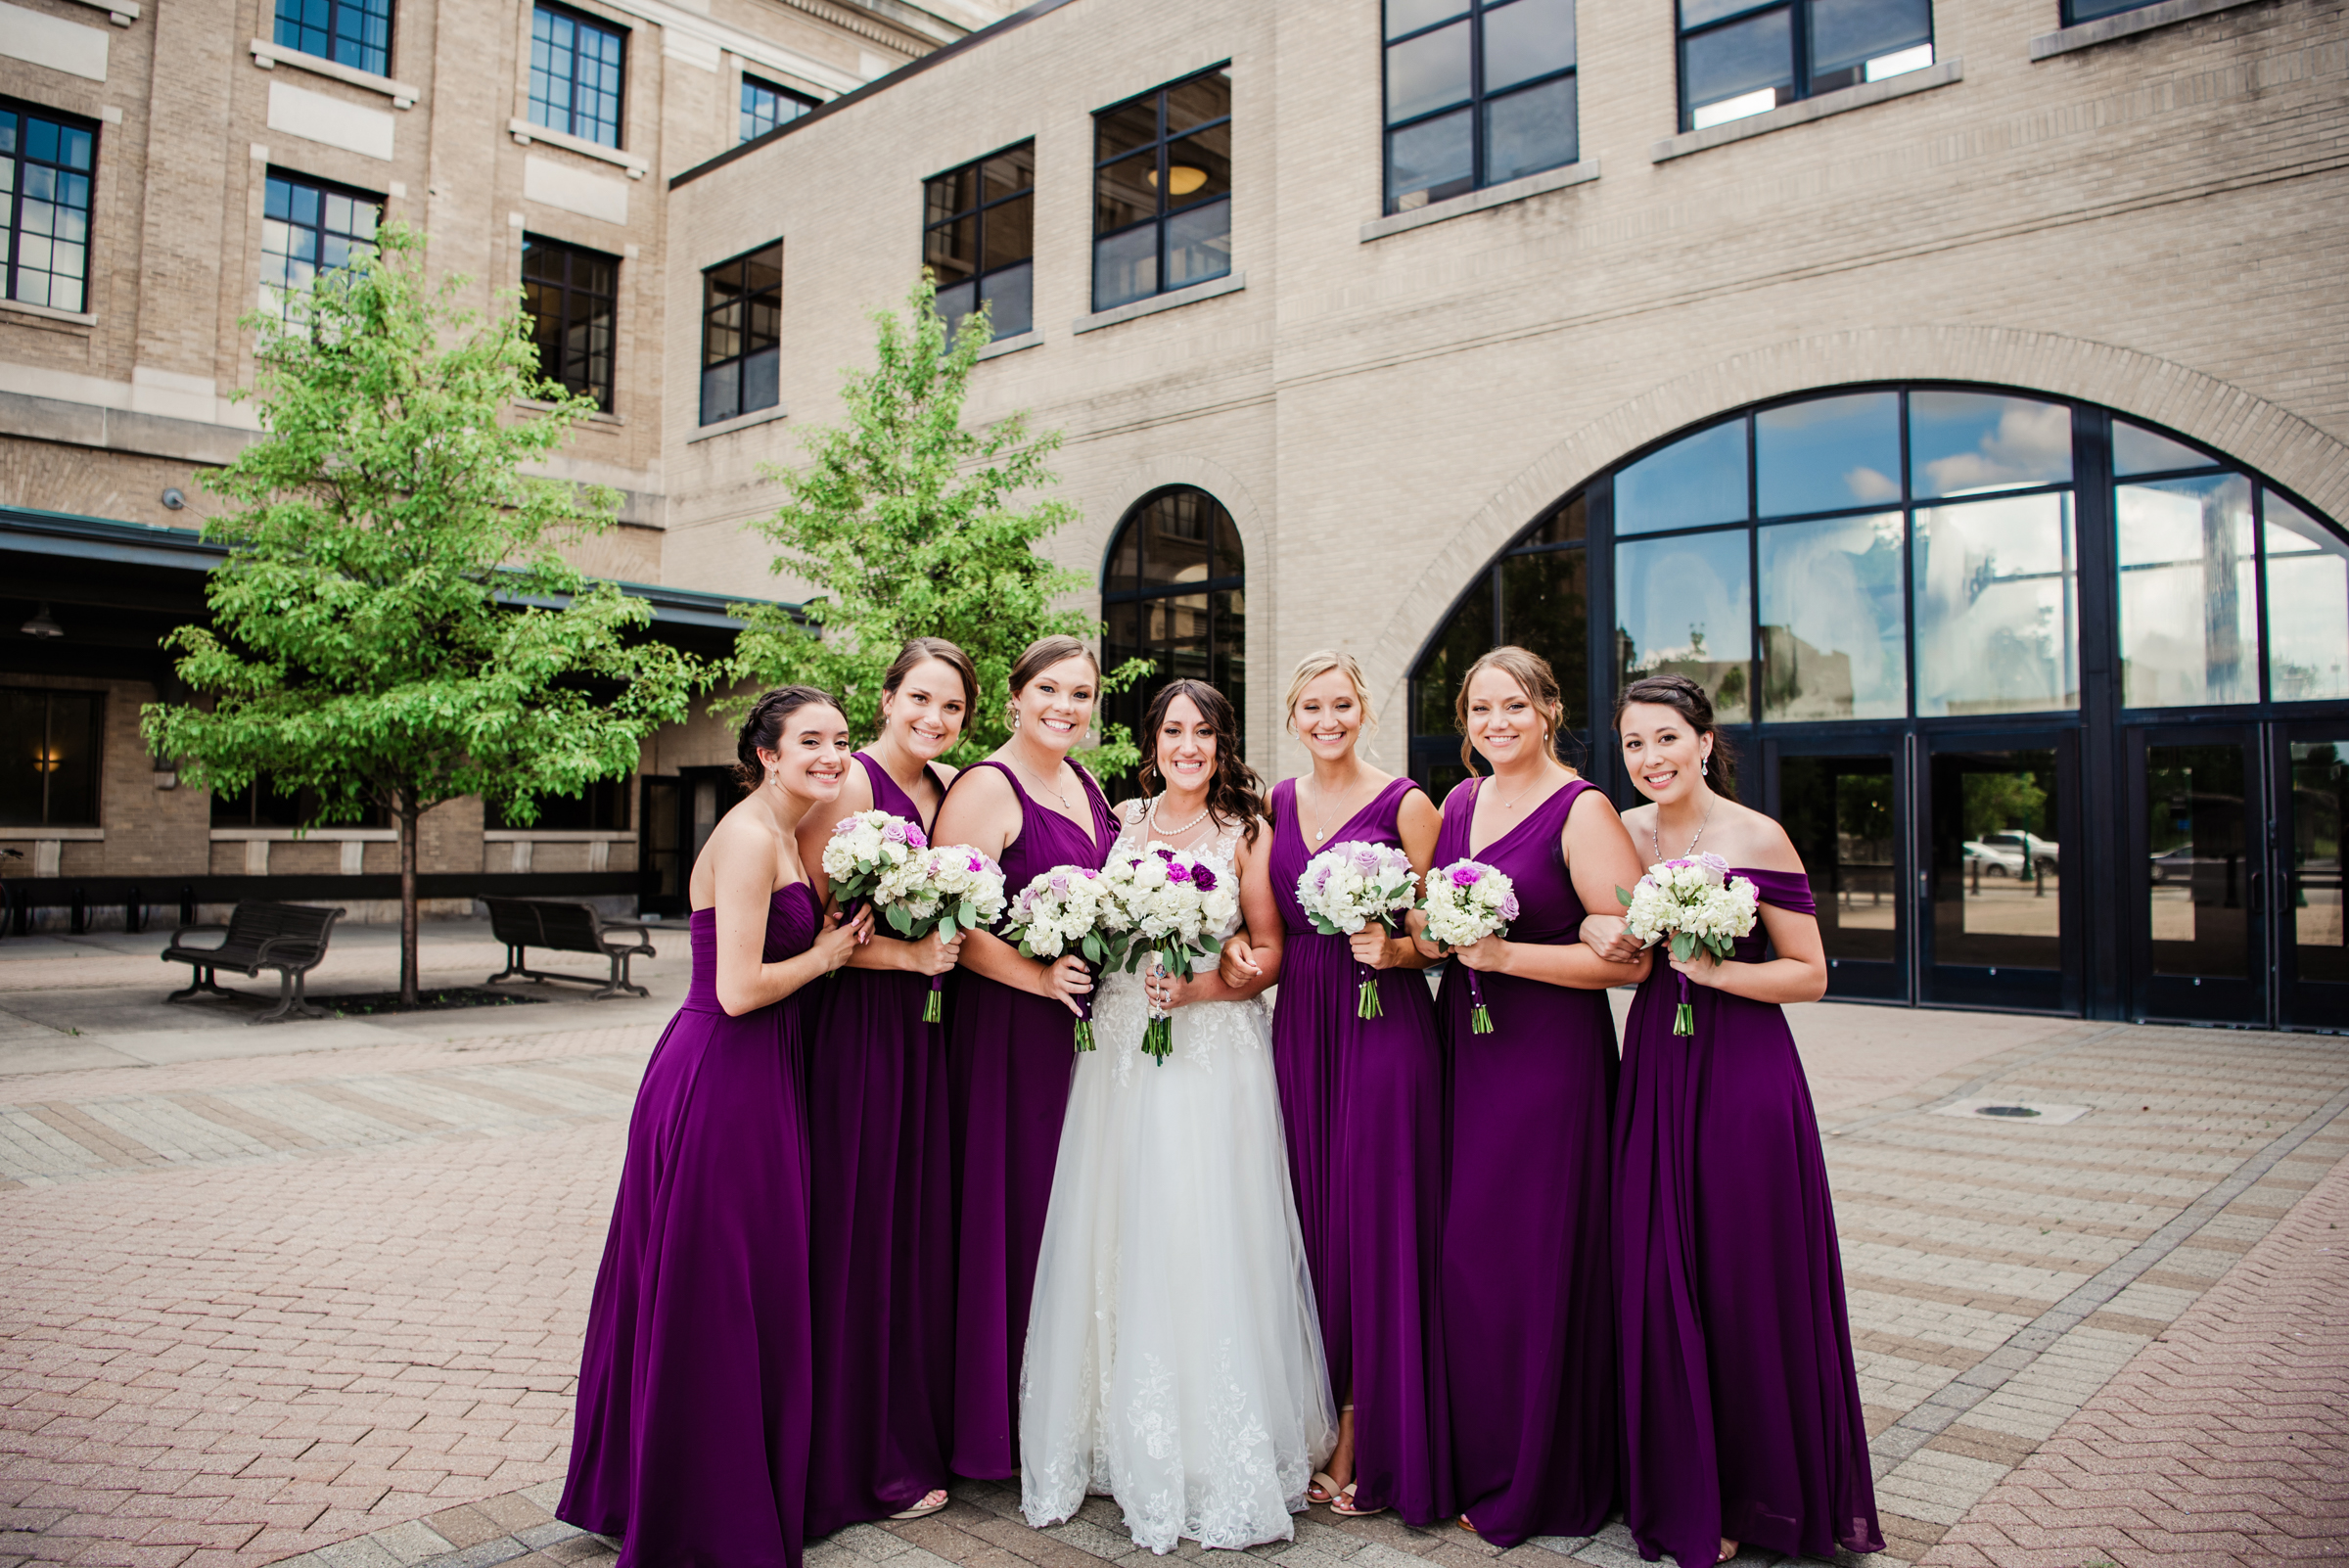 Historic_Old_St_Johns_Church_Valentinos_Banquet_Hall_Central_NY_Wedding_JILL_STUDIO_Rochester_NY_Photographer_DSC_6310.jpg